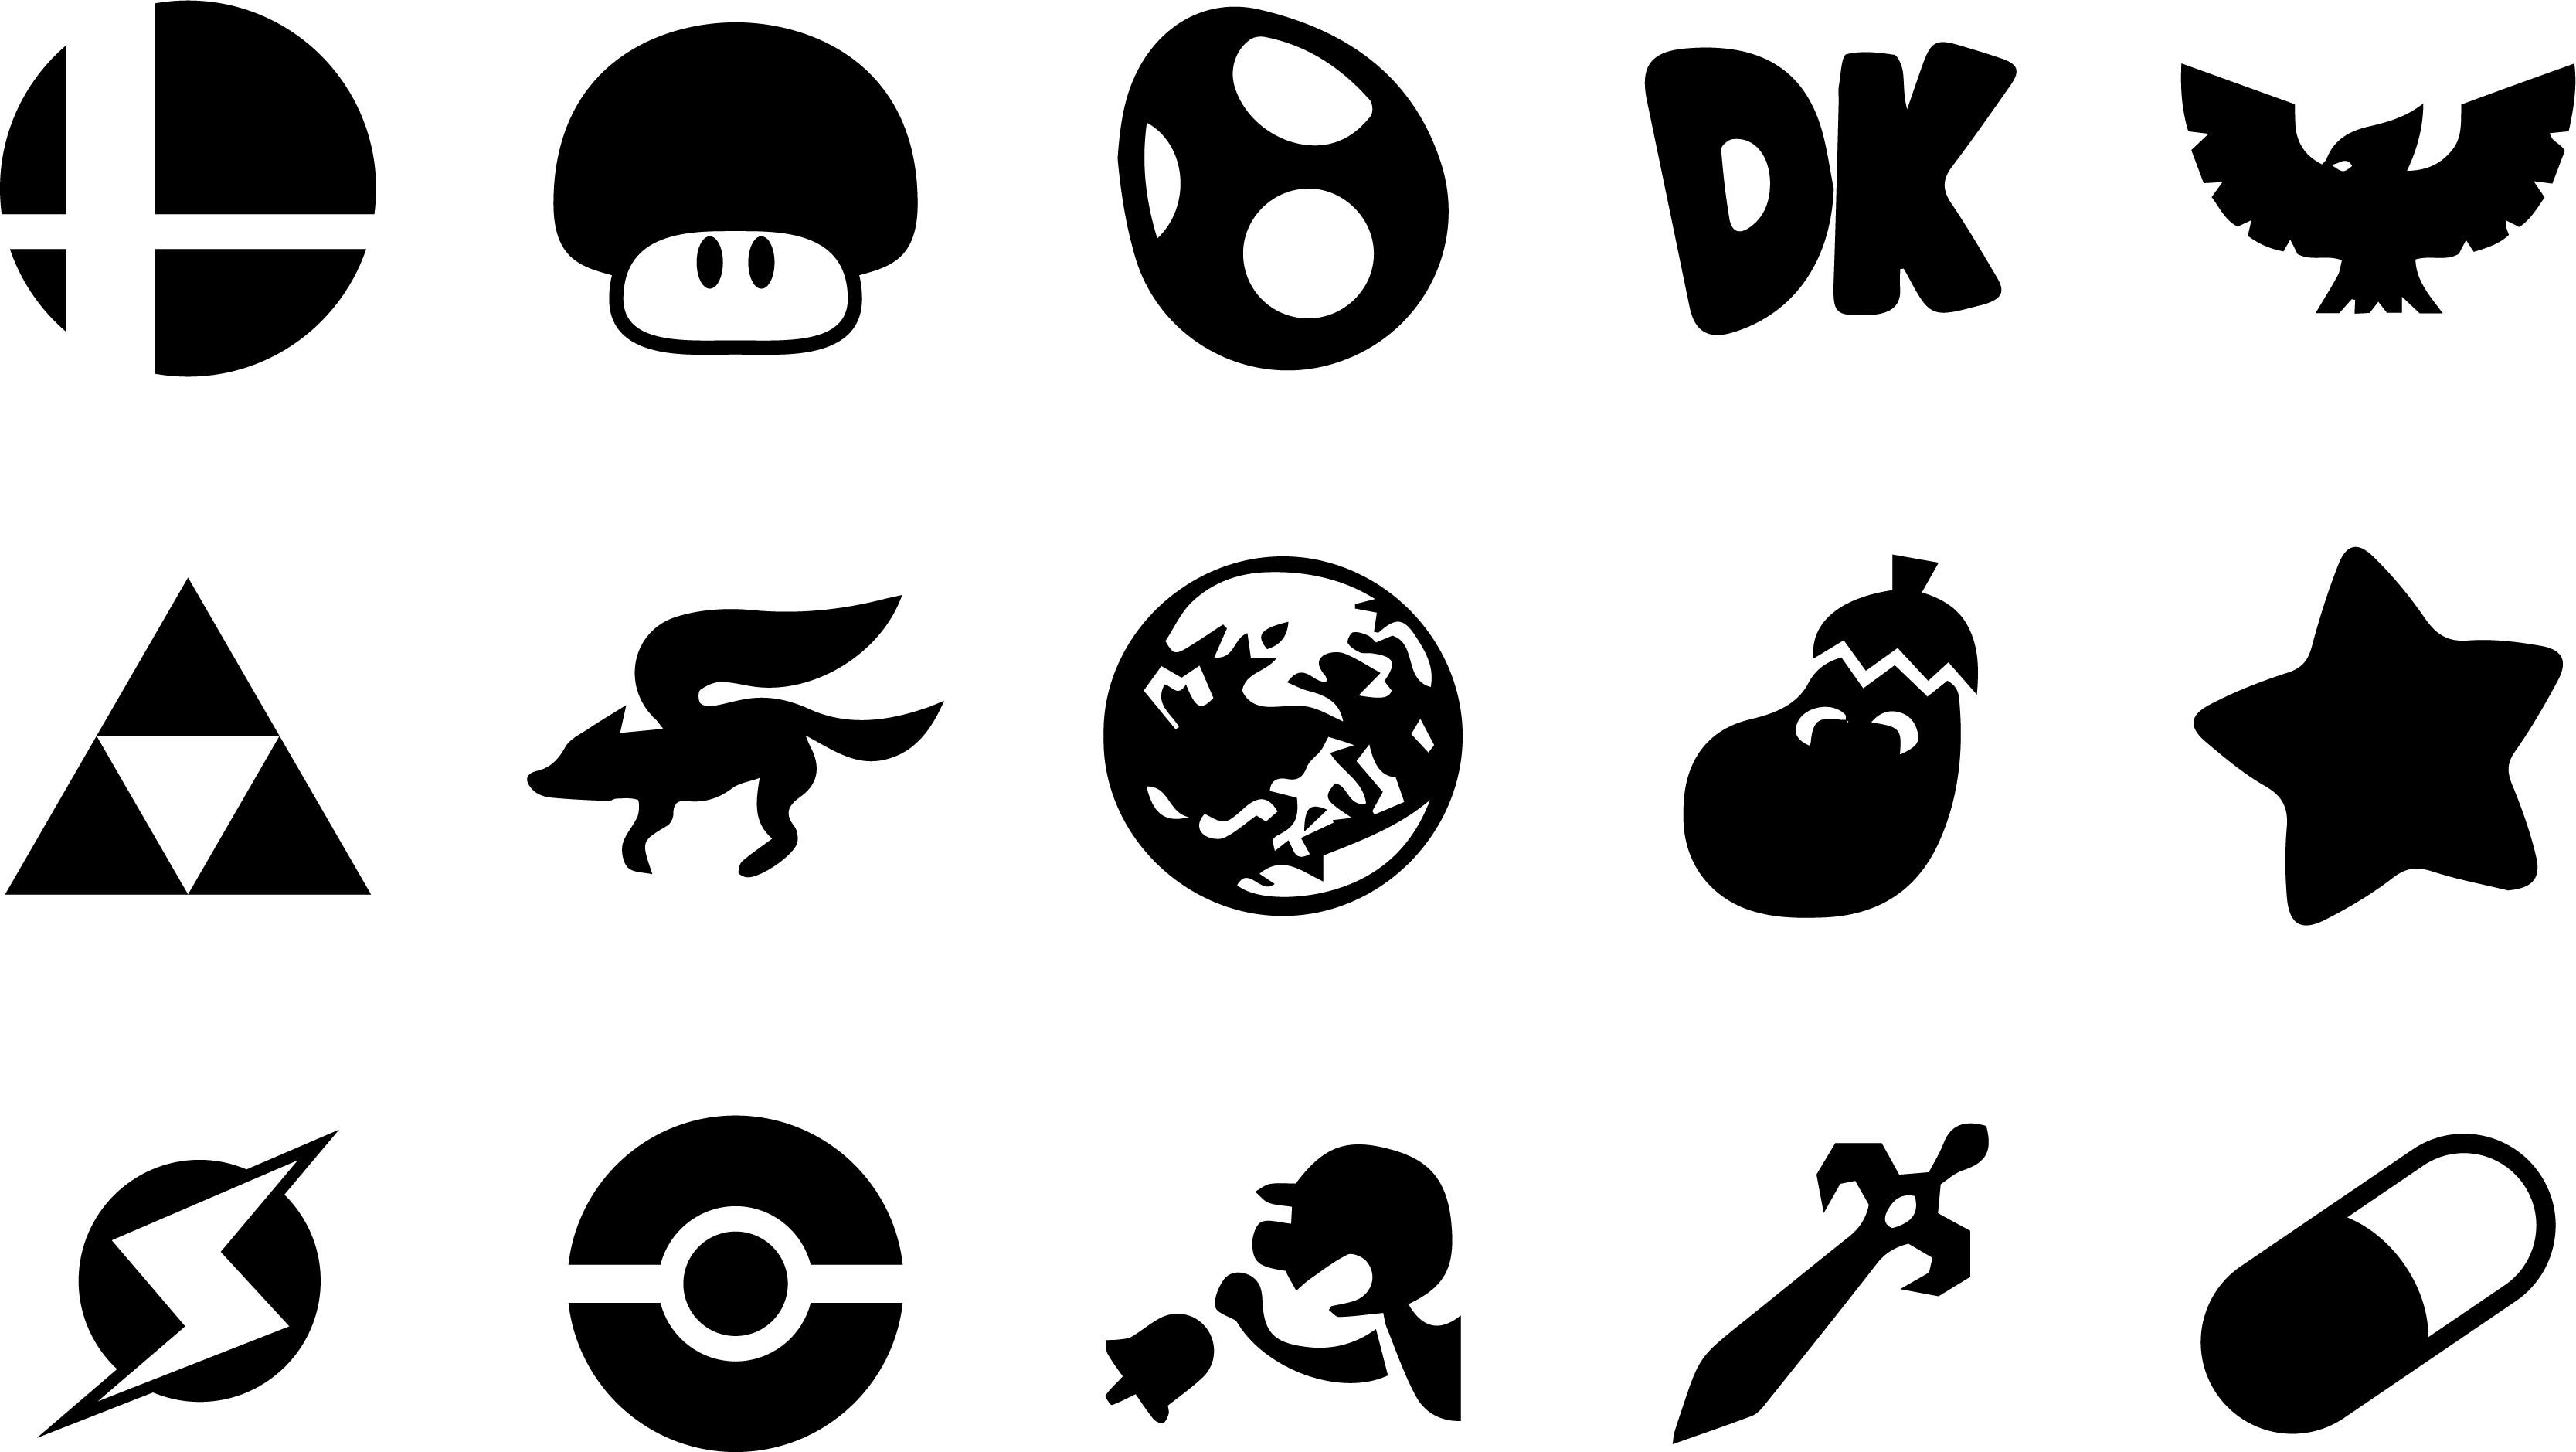 … Super Smash Bros Melee Icons by one-seb